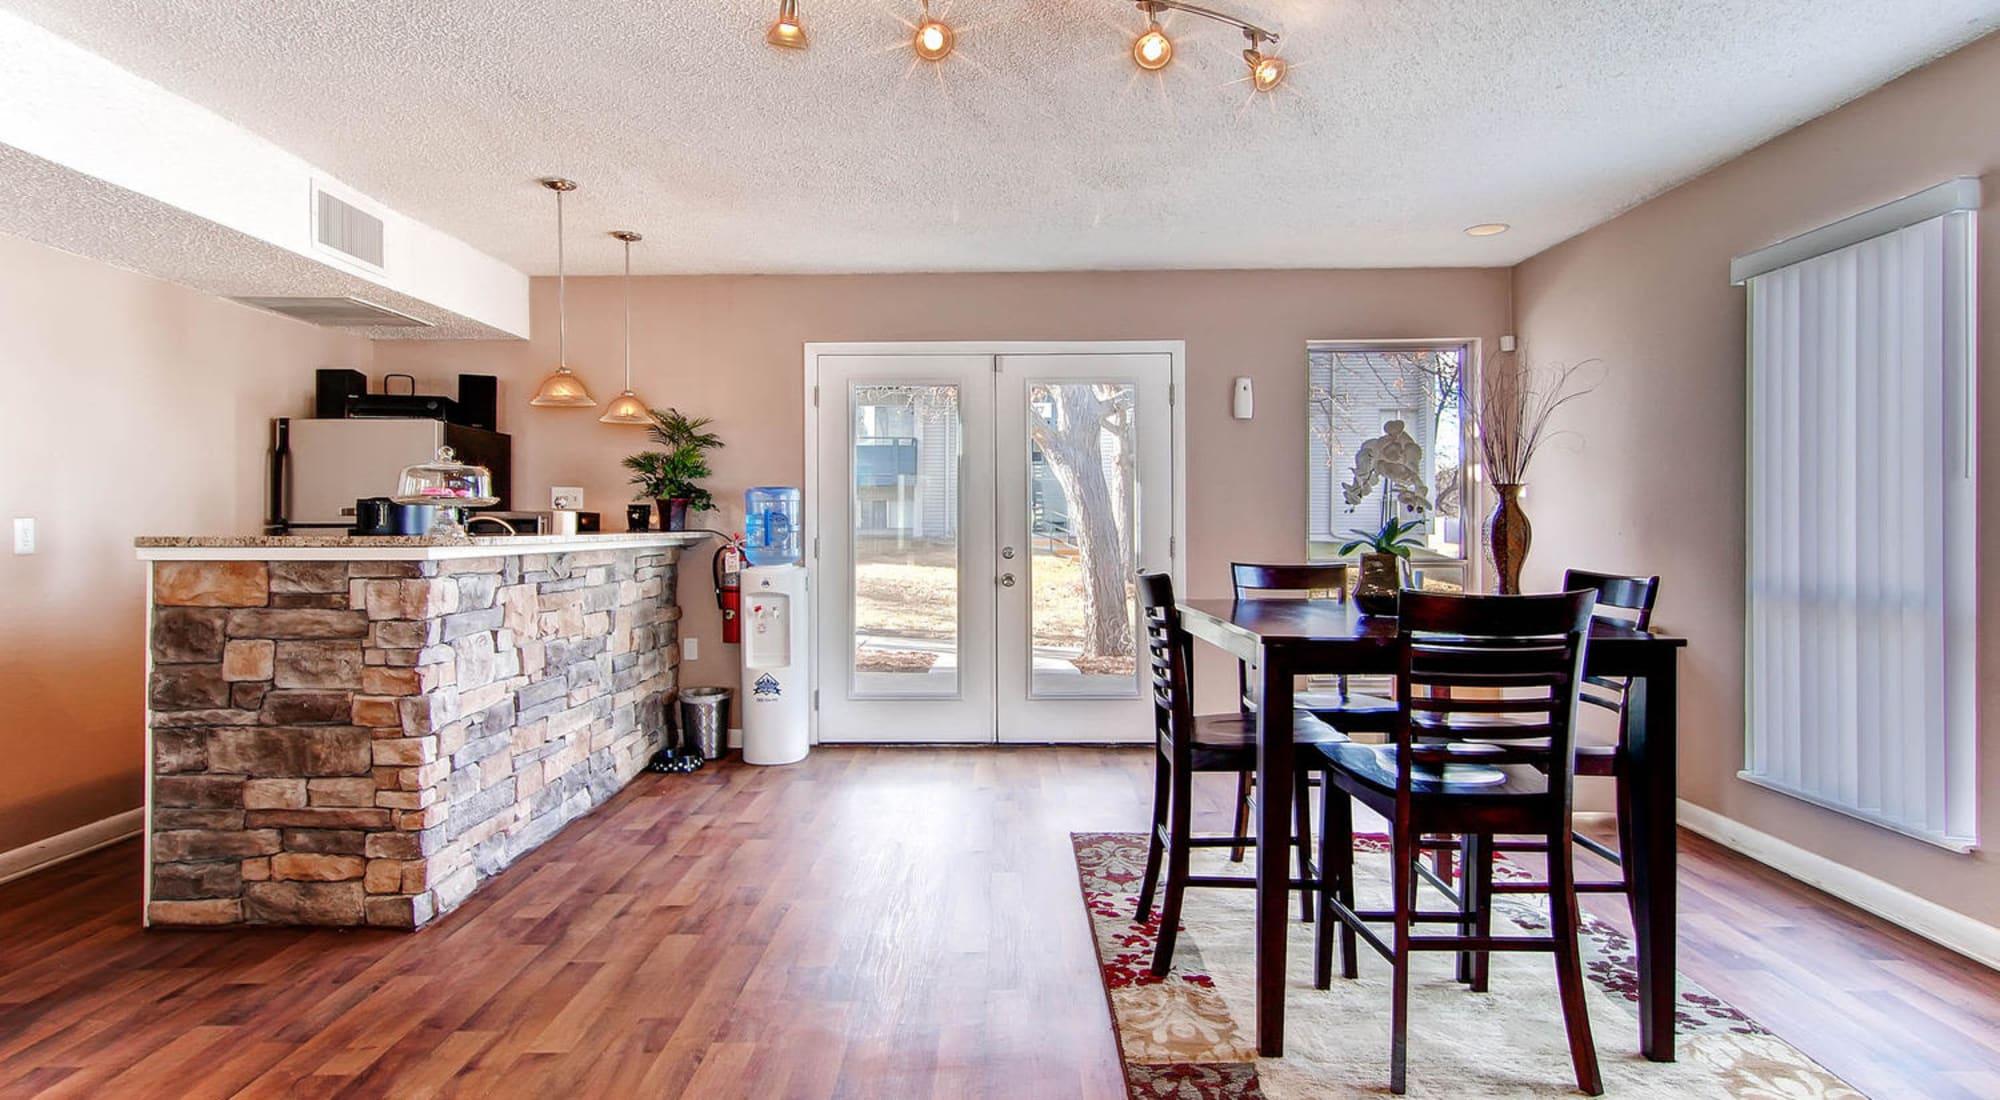 Schedule your tour of Arvada Village Apartment Homes in Arvada, Colorado